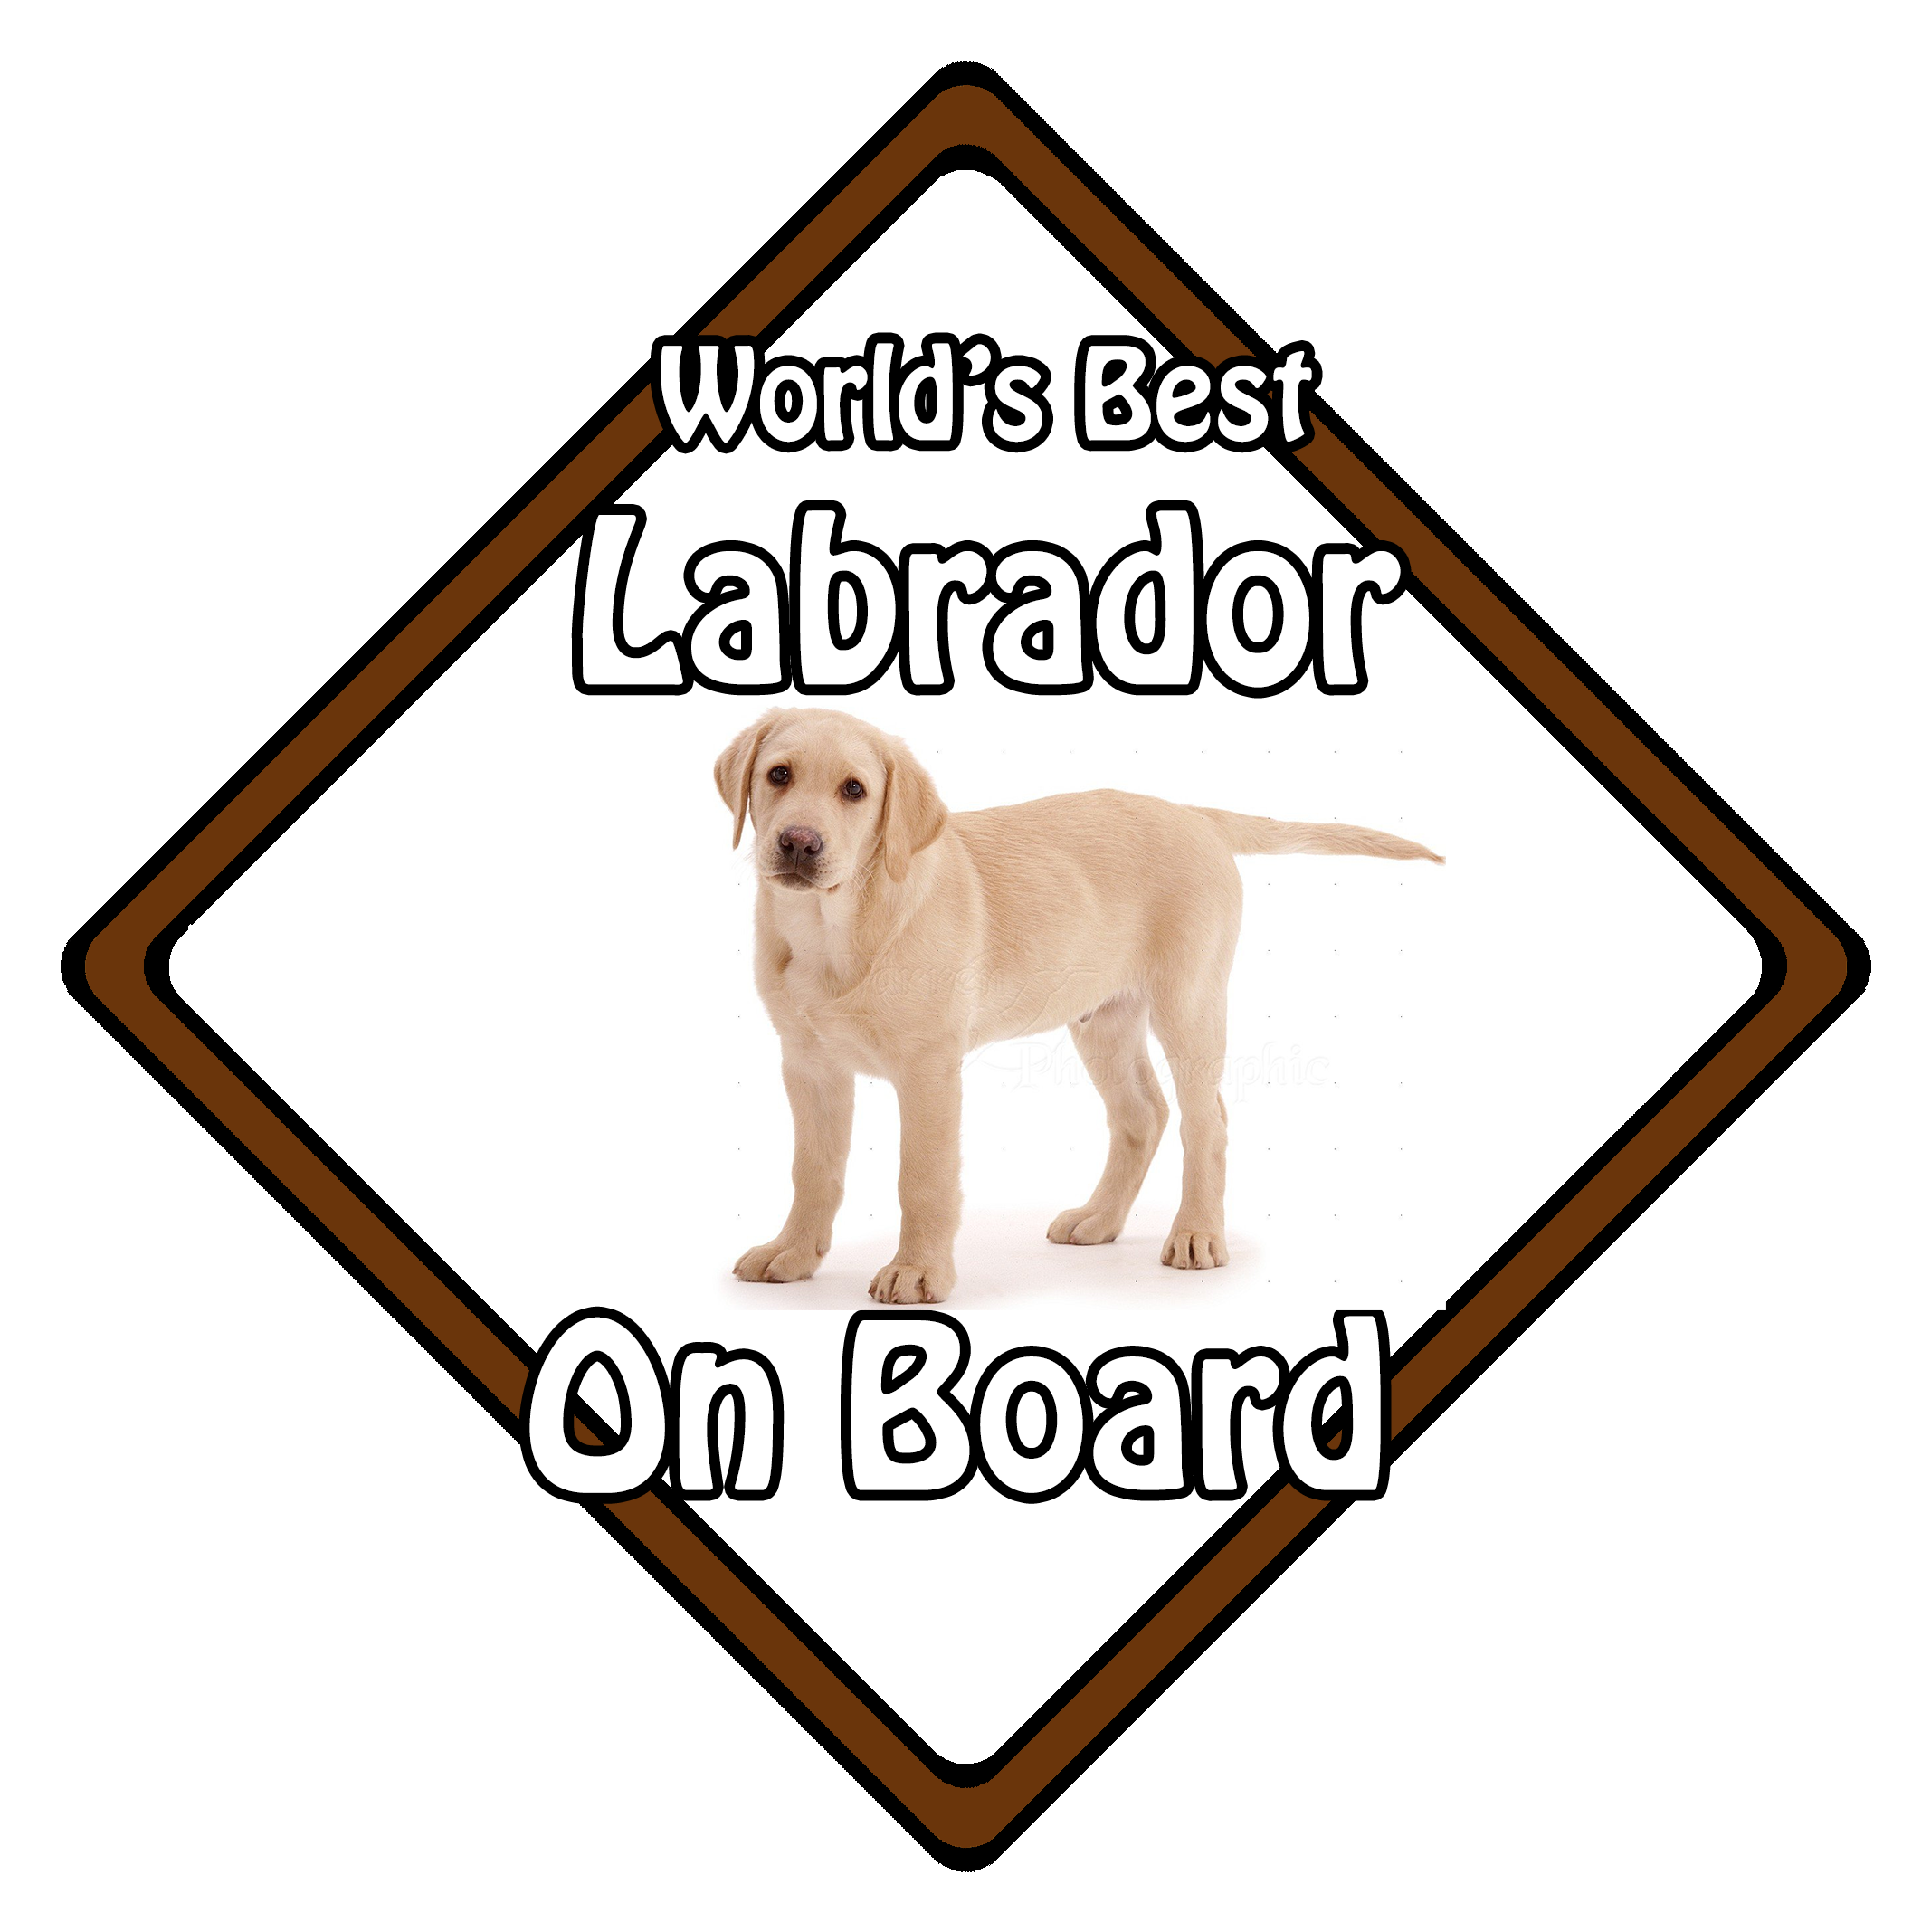 Worlds Best Labrador Blonde On Board Car Sign